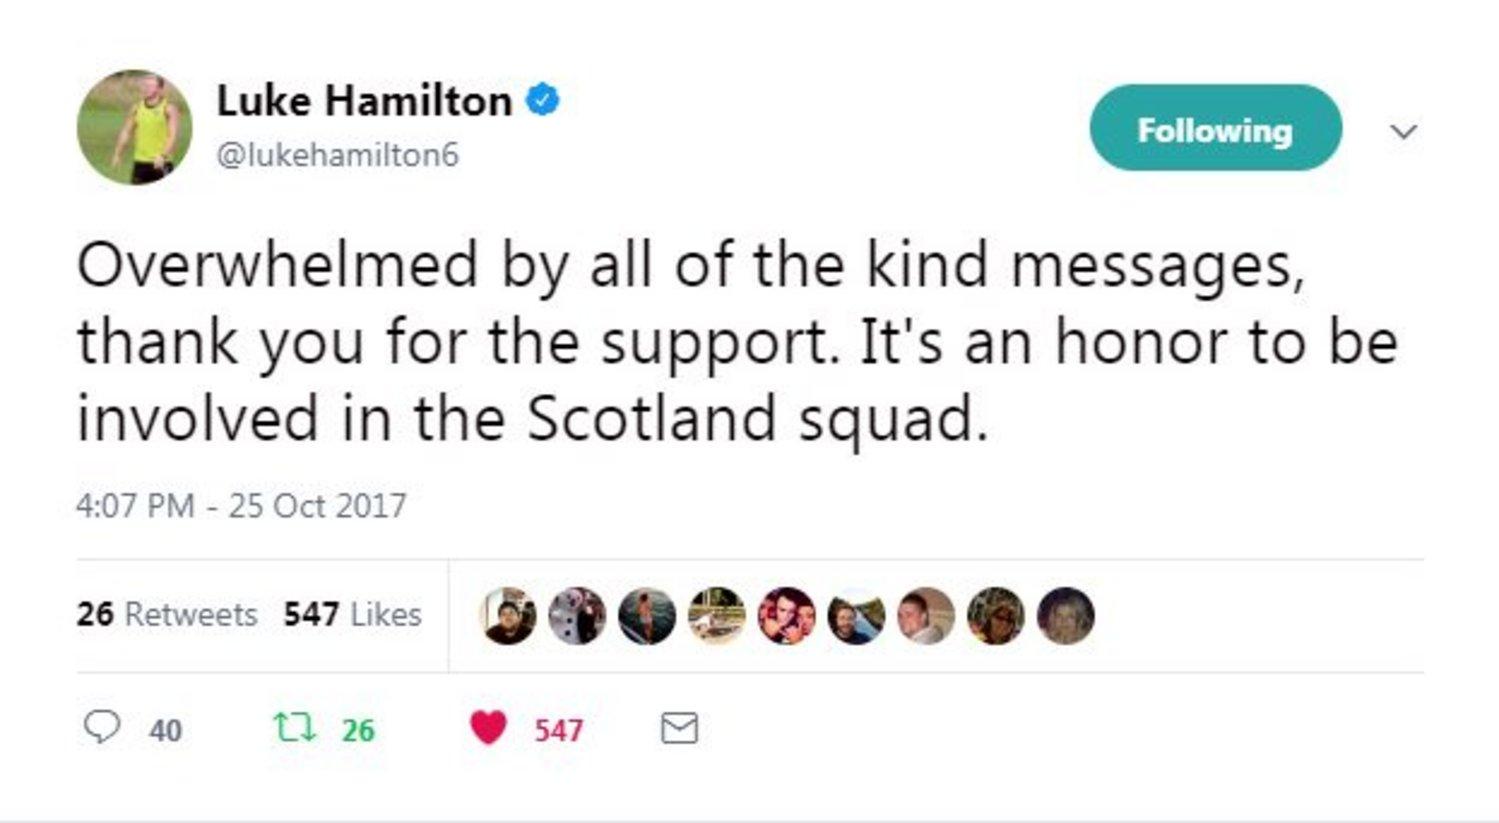 Luke Hamilton Scotland tweet